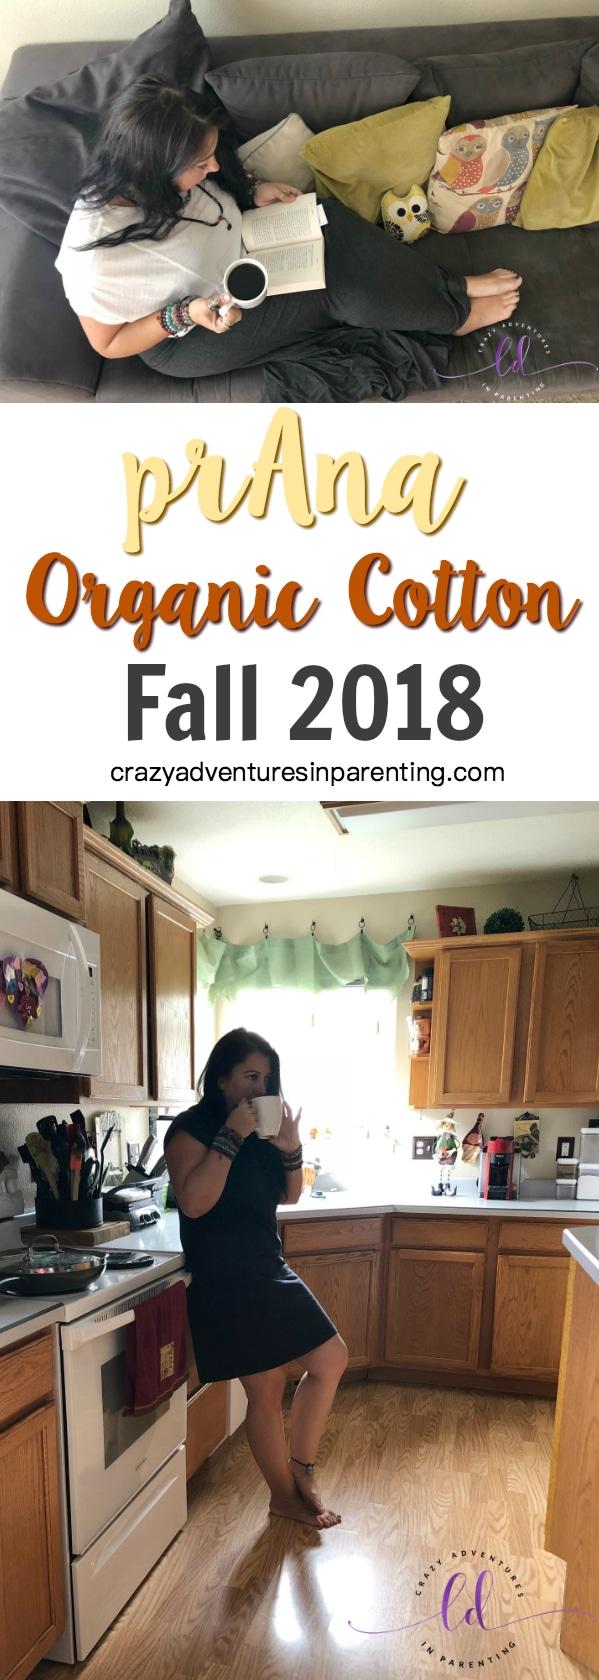 prAna Organic Cotton Fall 2018